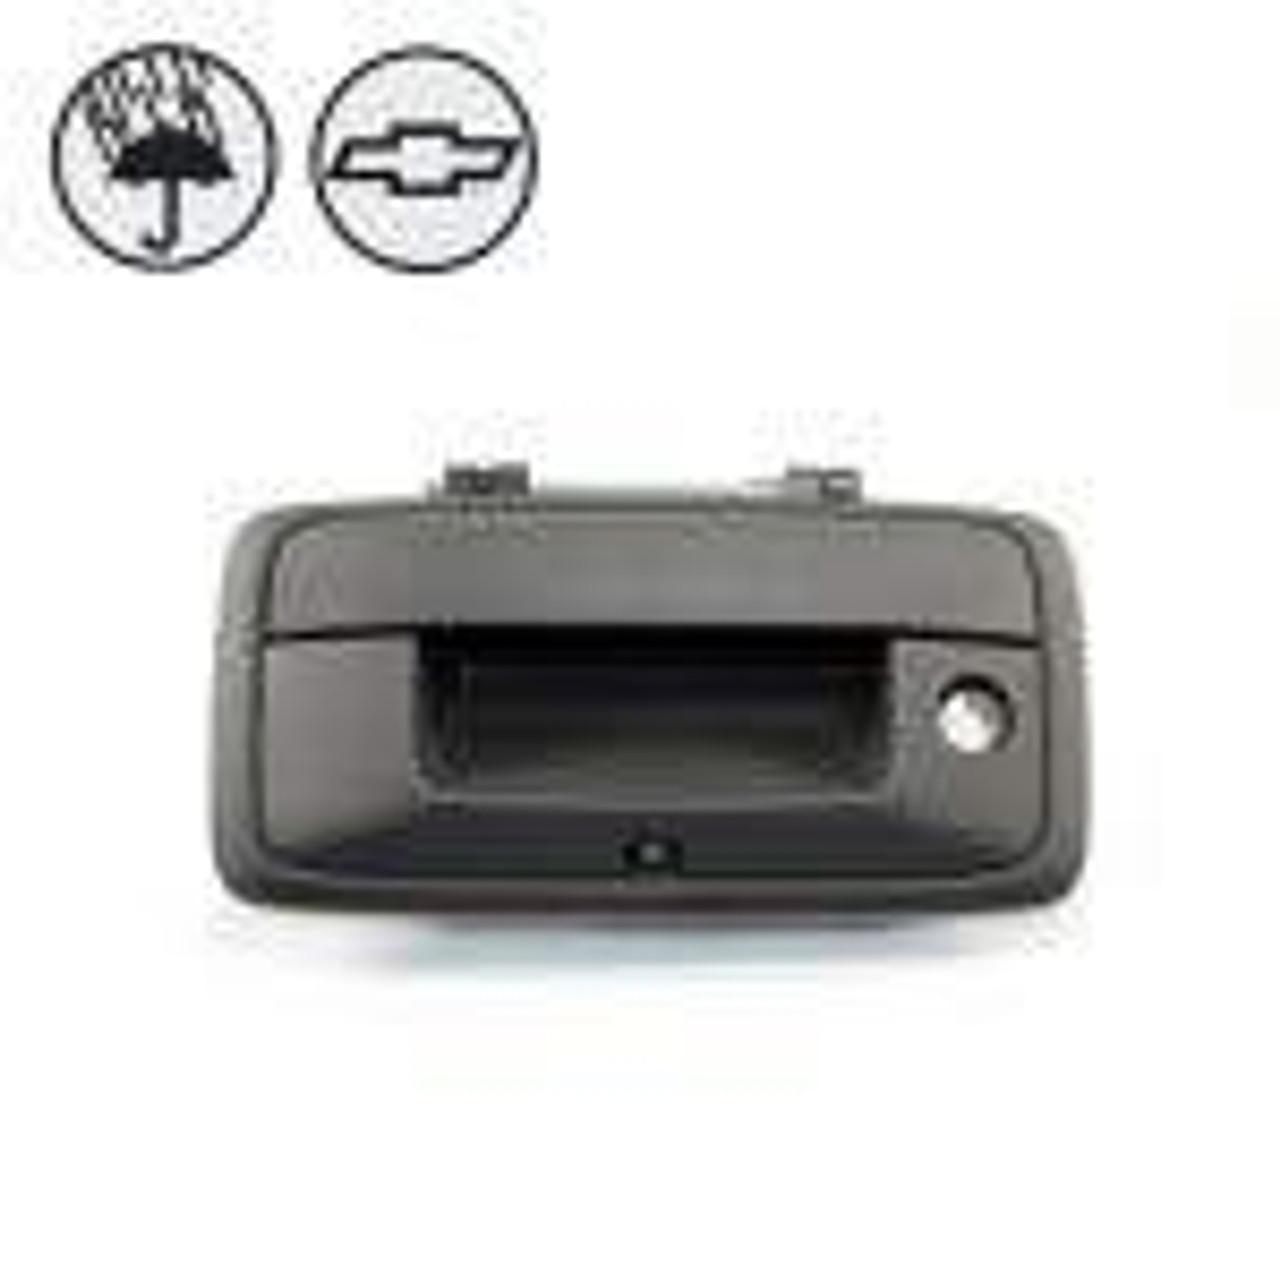 Tailgate Handle Backup Camera for GMC Sierra and Chevrolet Silverado (2014-2017)